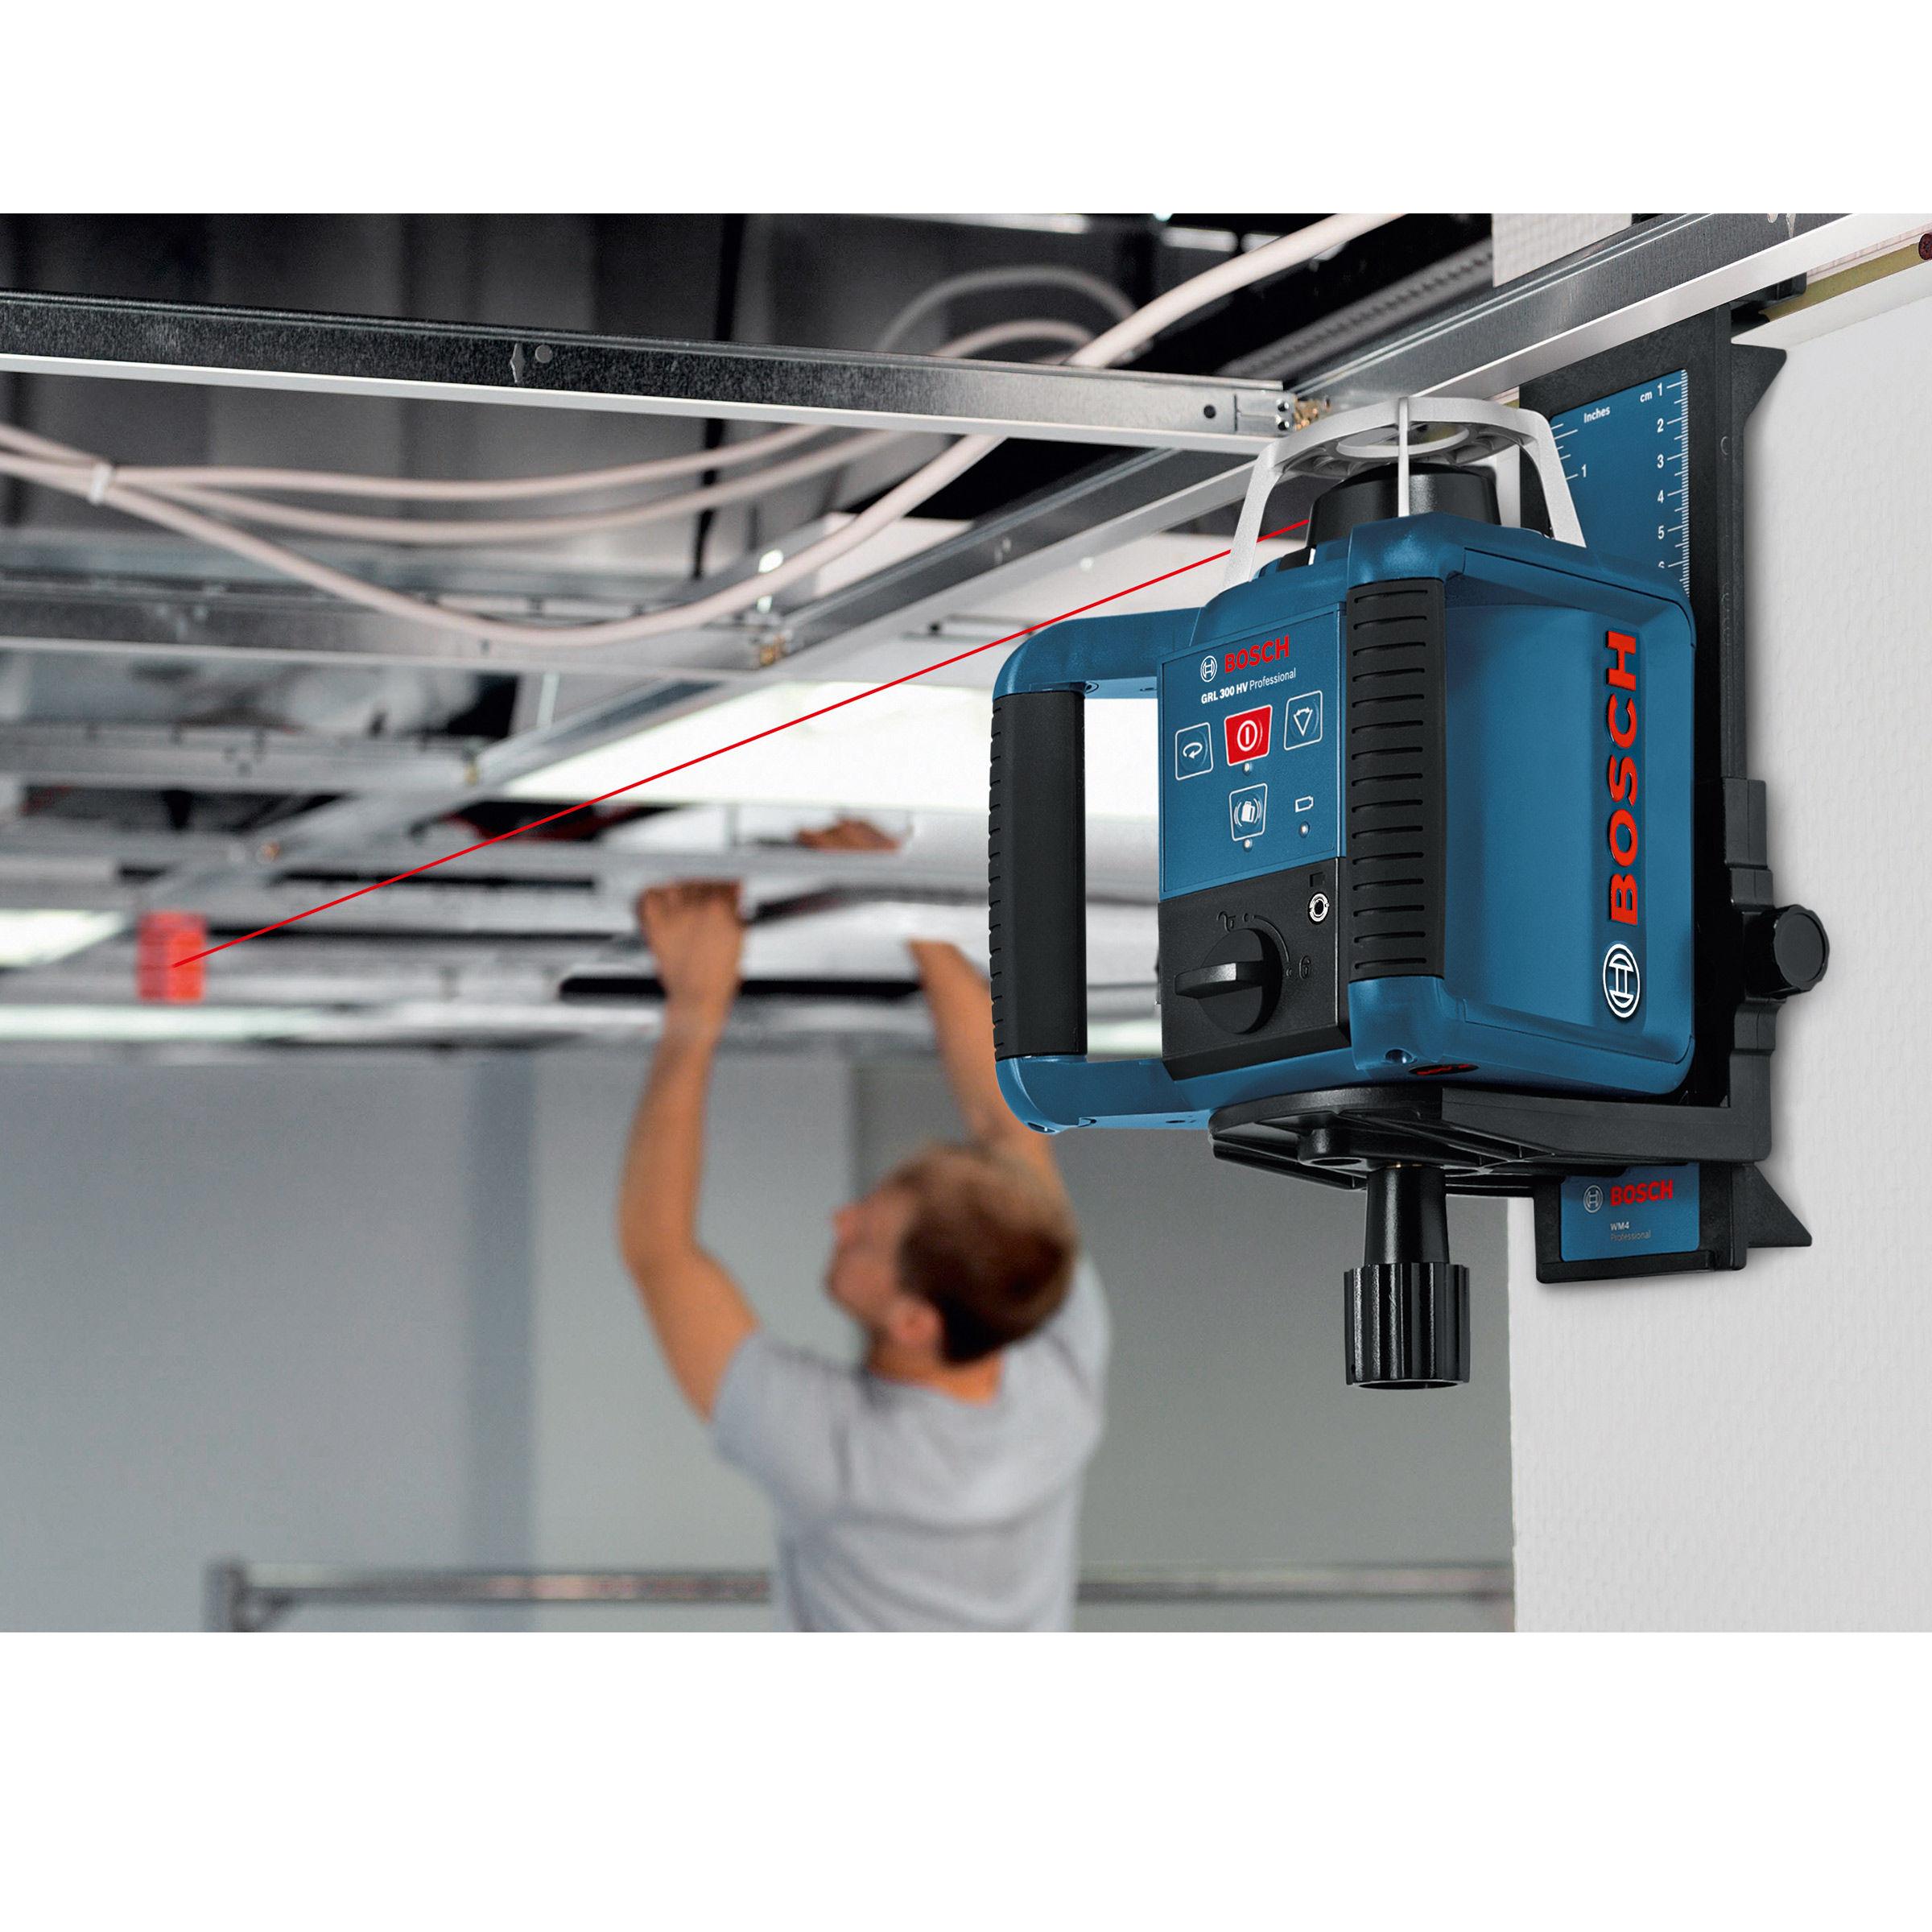 Toolstop Bosch GRL 300HV + LR1 + WM4 + RC1 - Rotary Laser Set